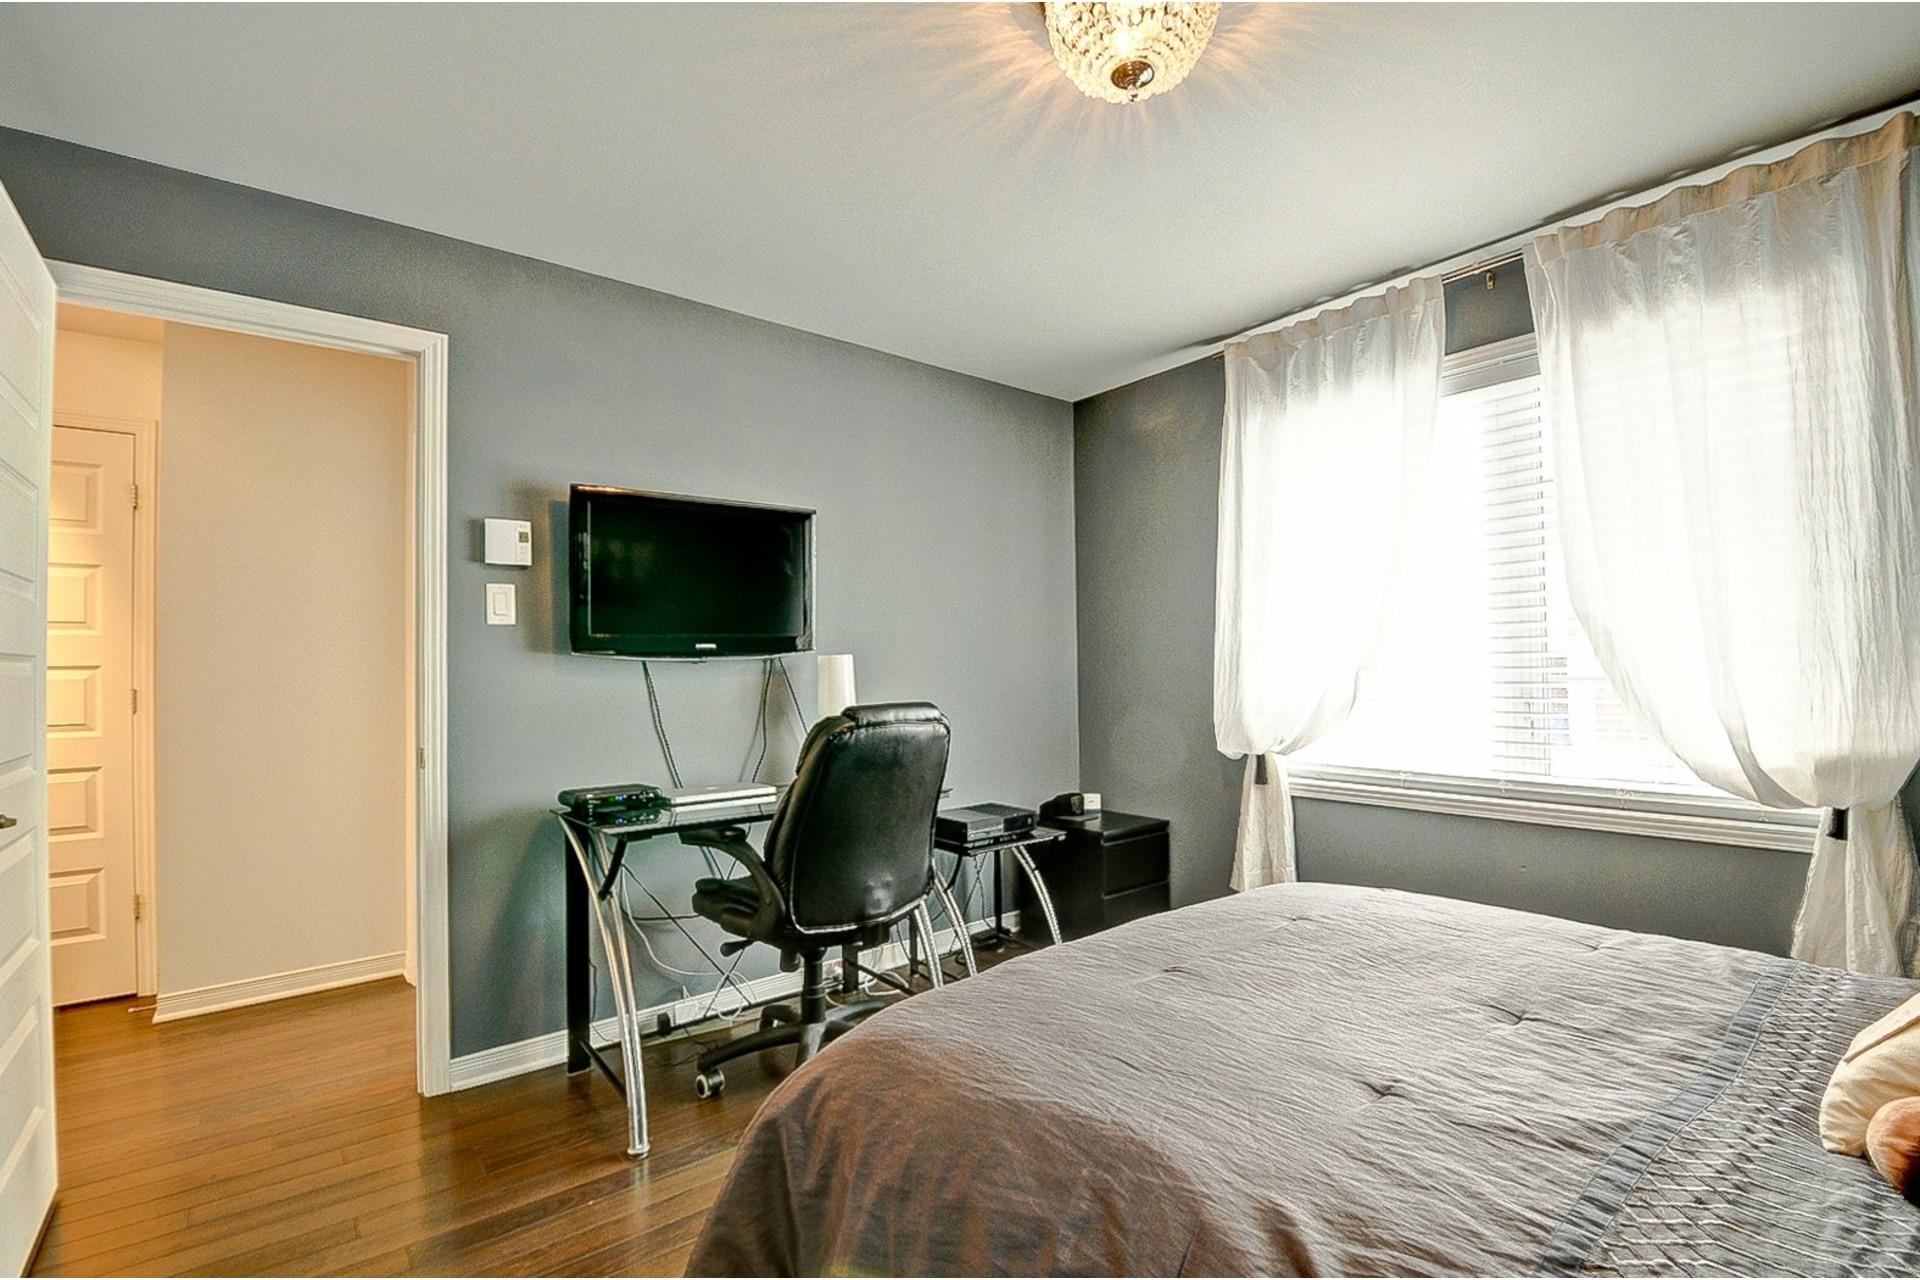 image 16 - Apartment For sale Vaudreuil-Dorion - 7 rooms